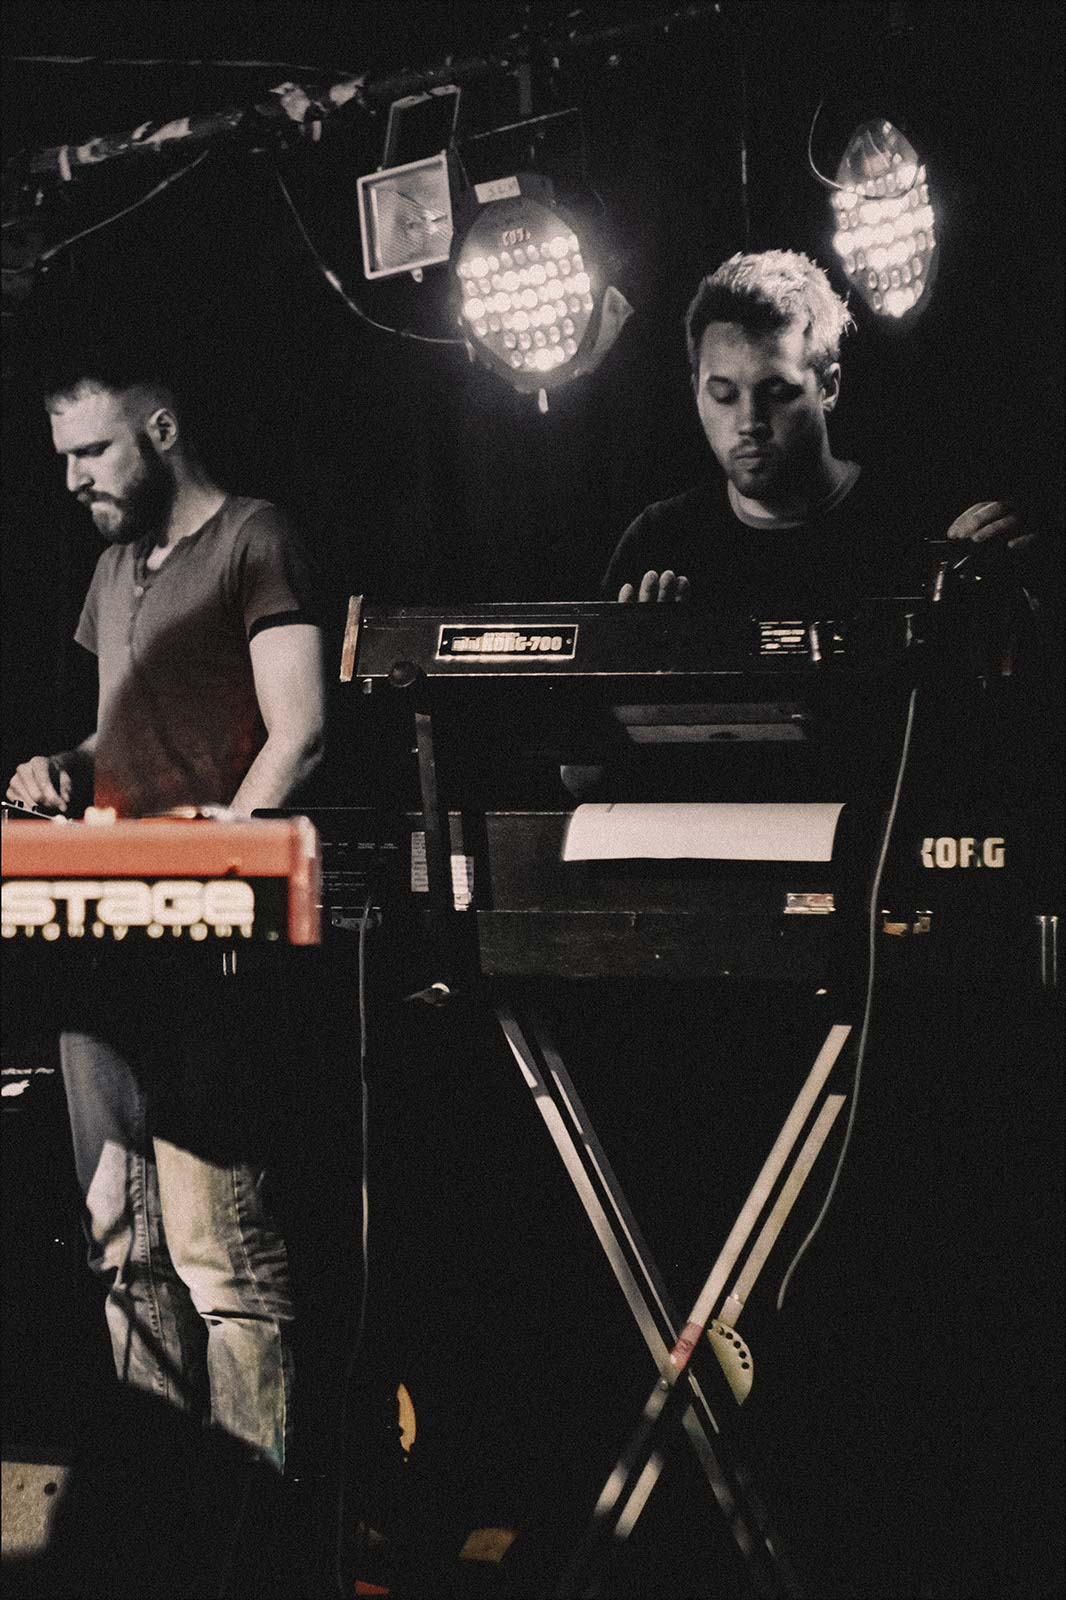 come_on_live_long_album_launch_whelans_dublin020.jpg